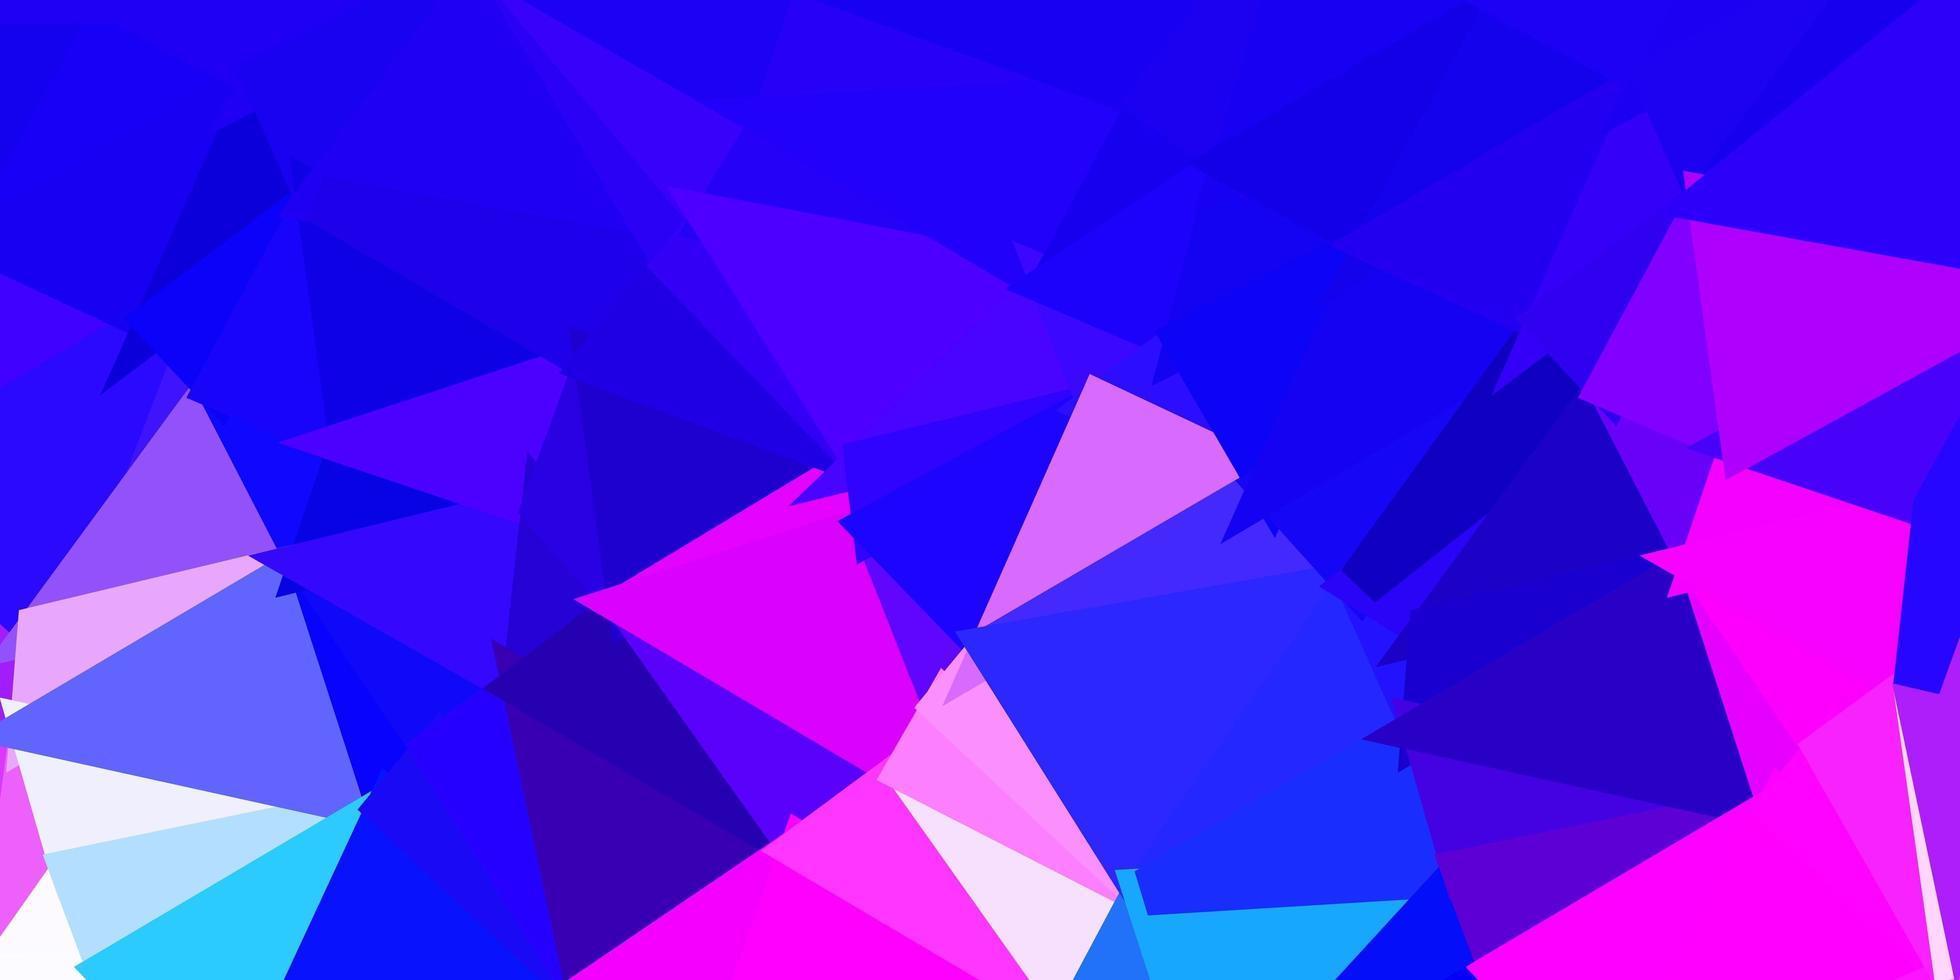 patrón de triángulo abstracto vector rosa oscuro, azul.